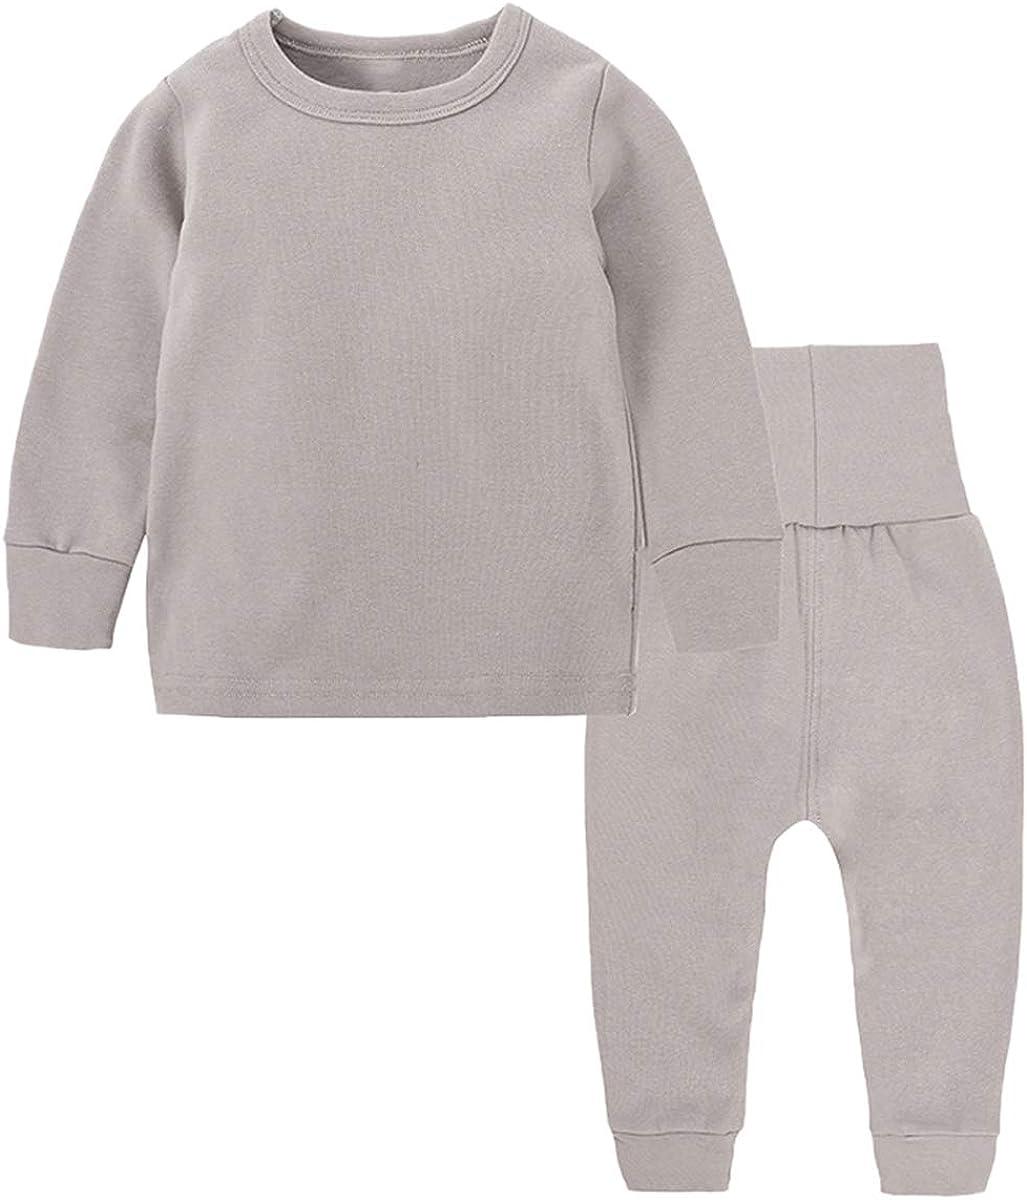 Toddler Boy's Thermal Underwear Set Base Layer Top & Bottom Set, Gray# 1, 3-4T = Tag 120